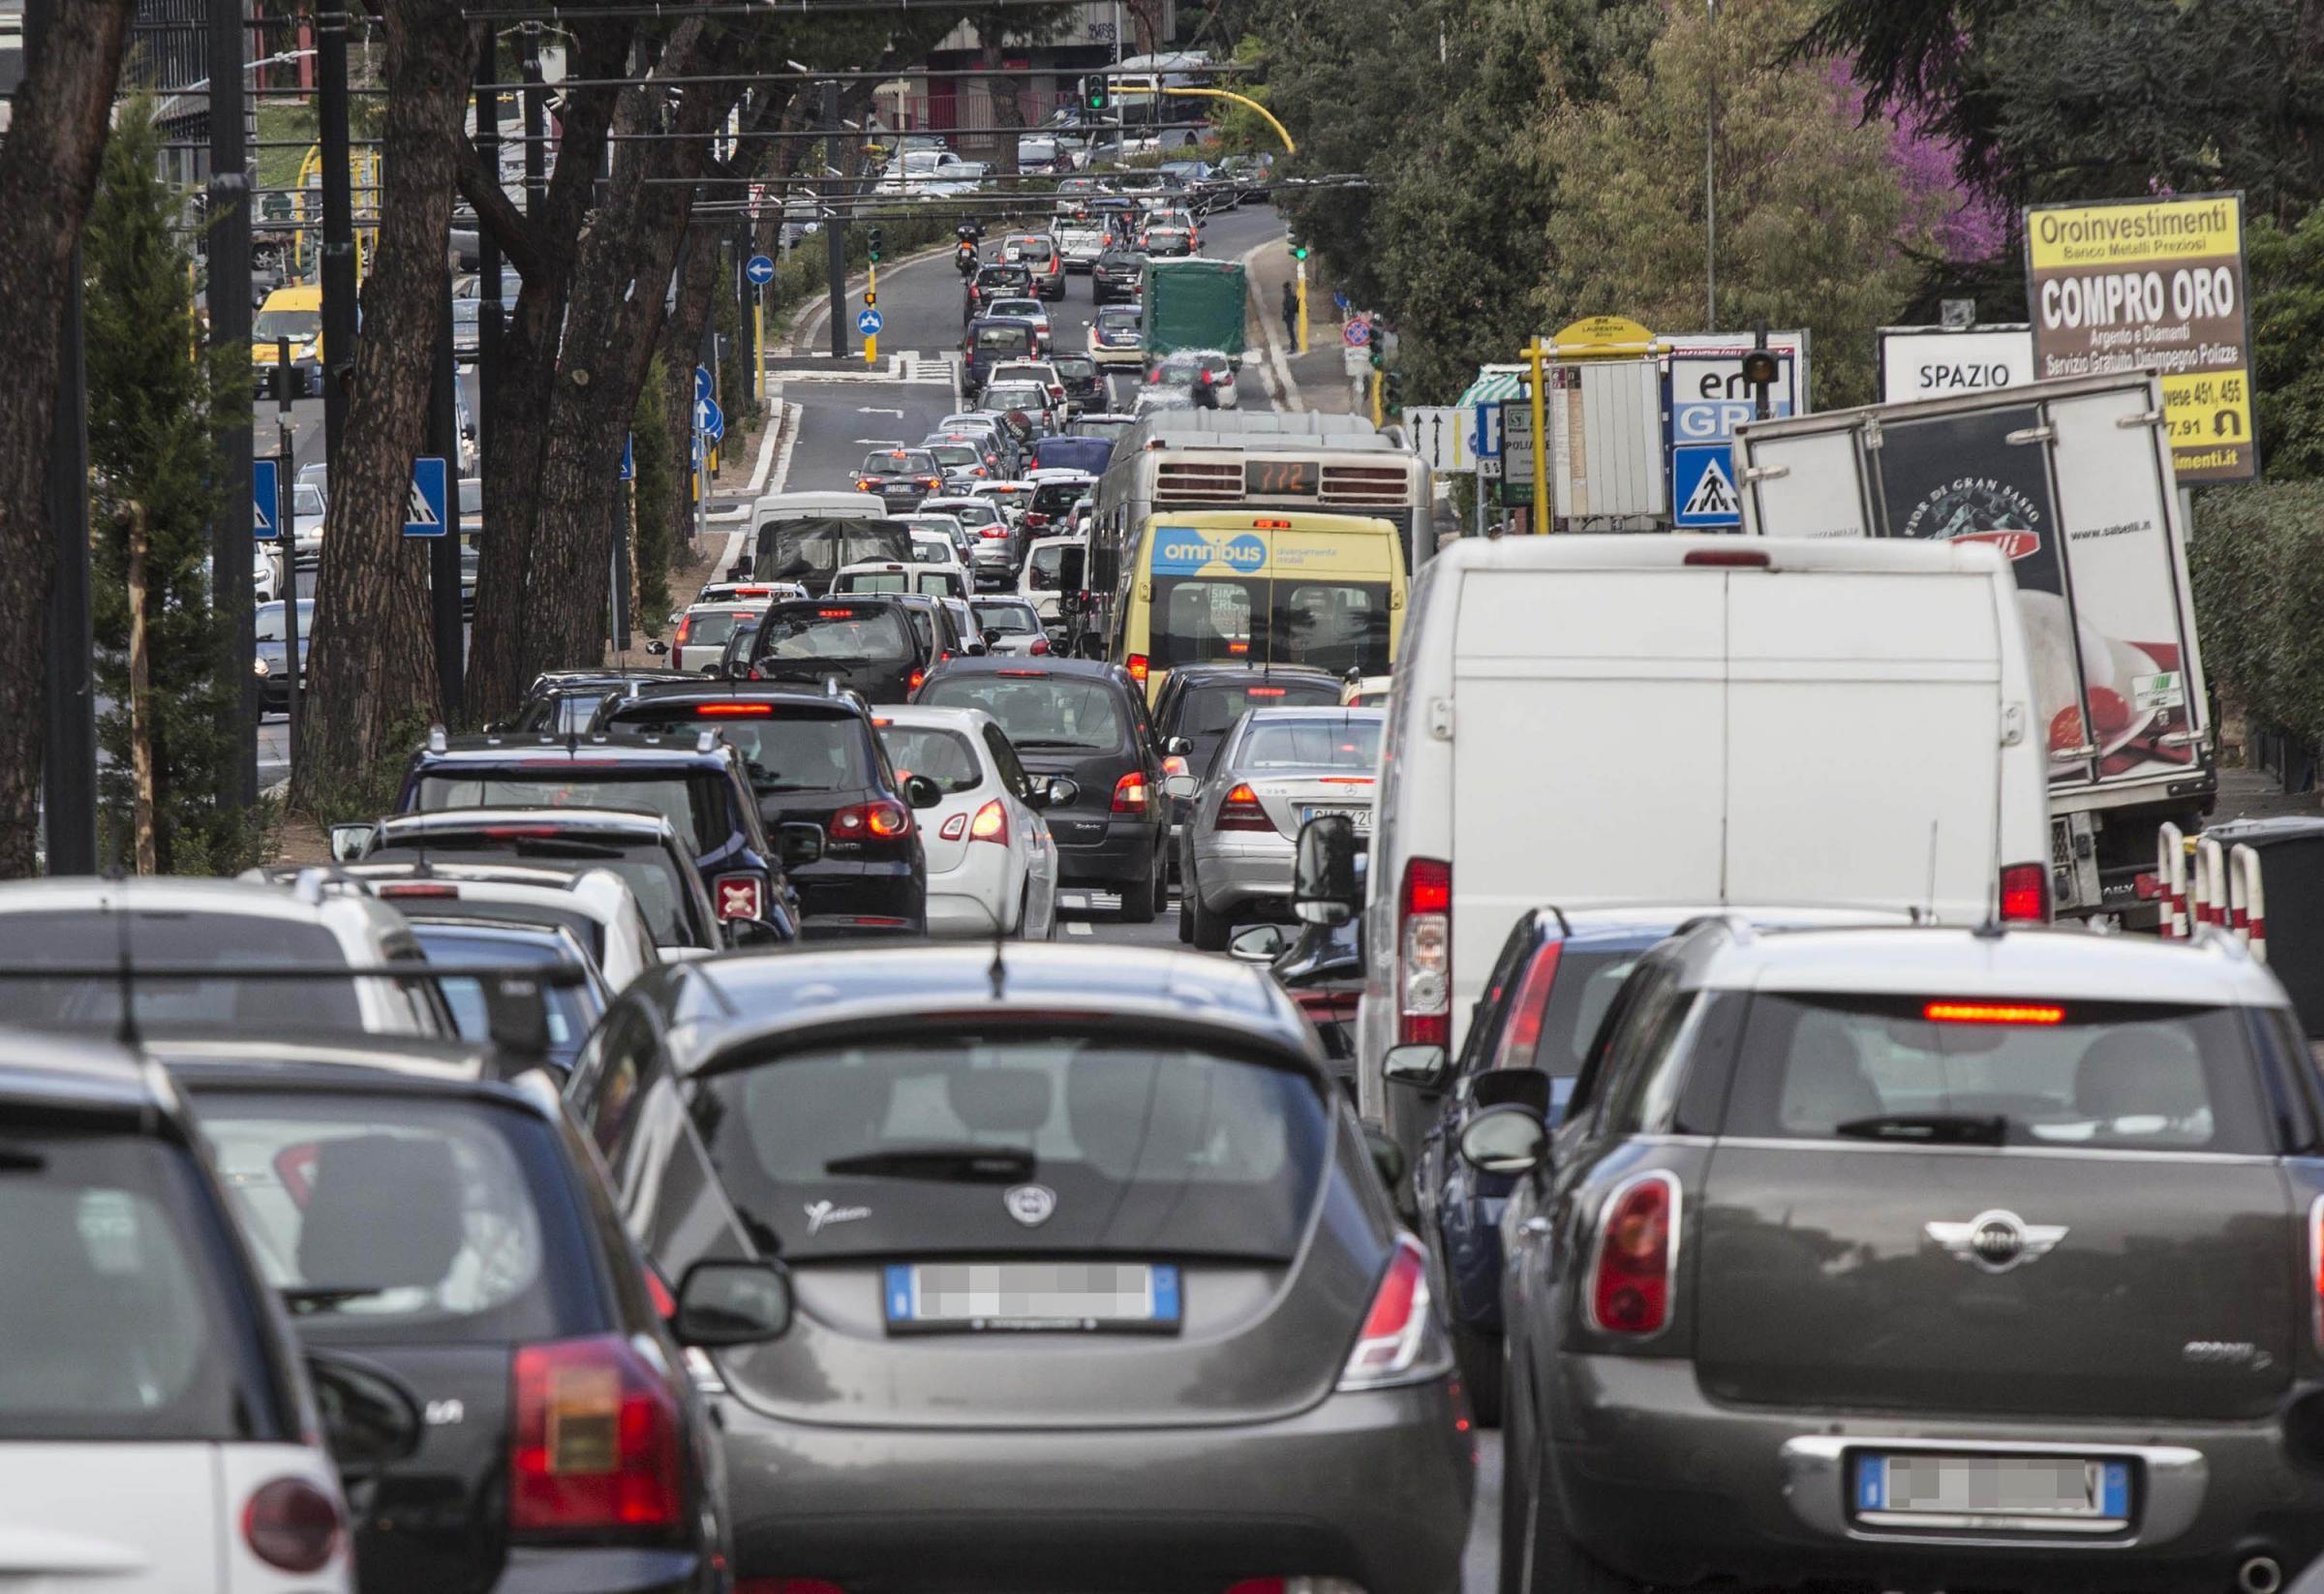 traffico-roma-eur.jpg